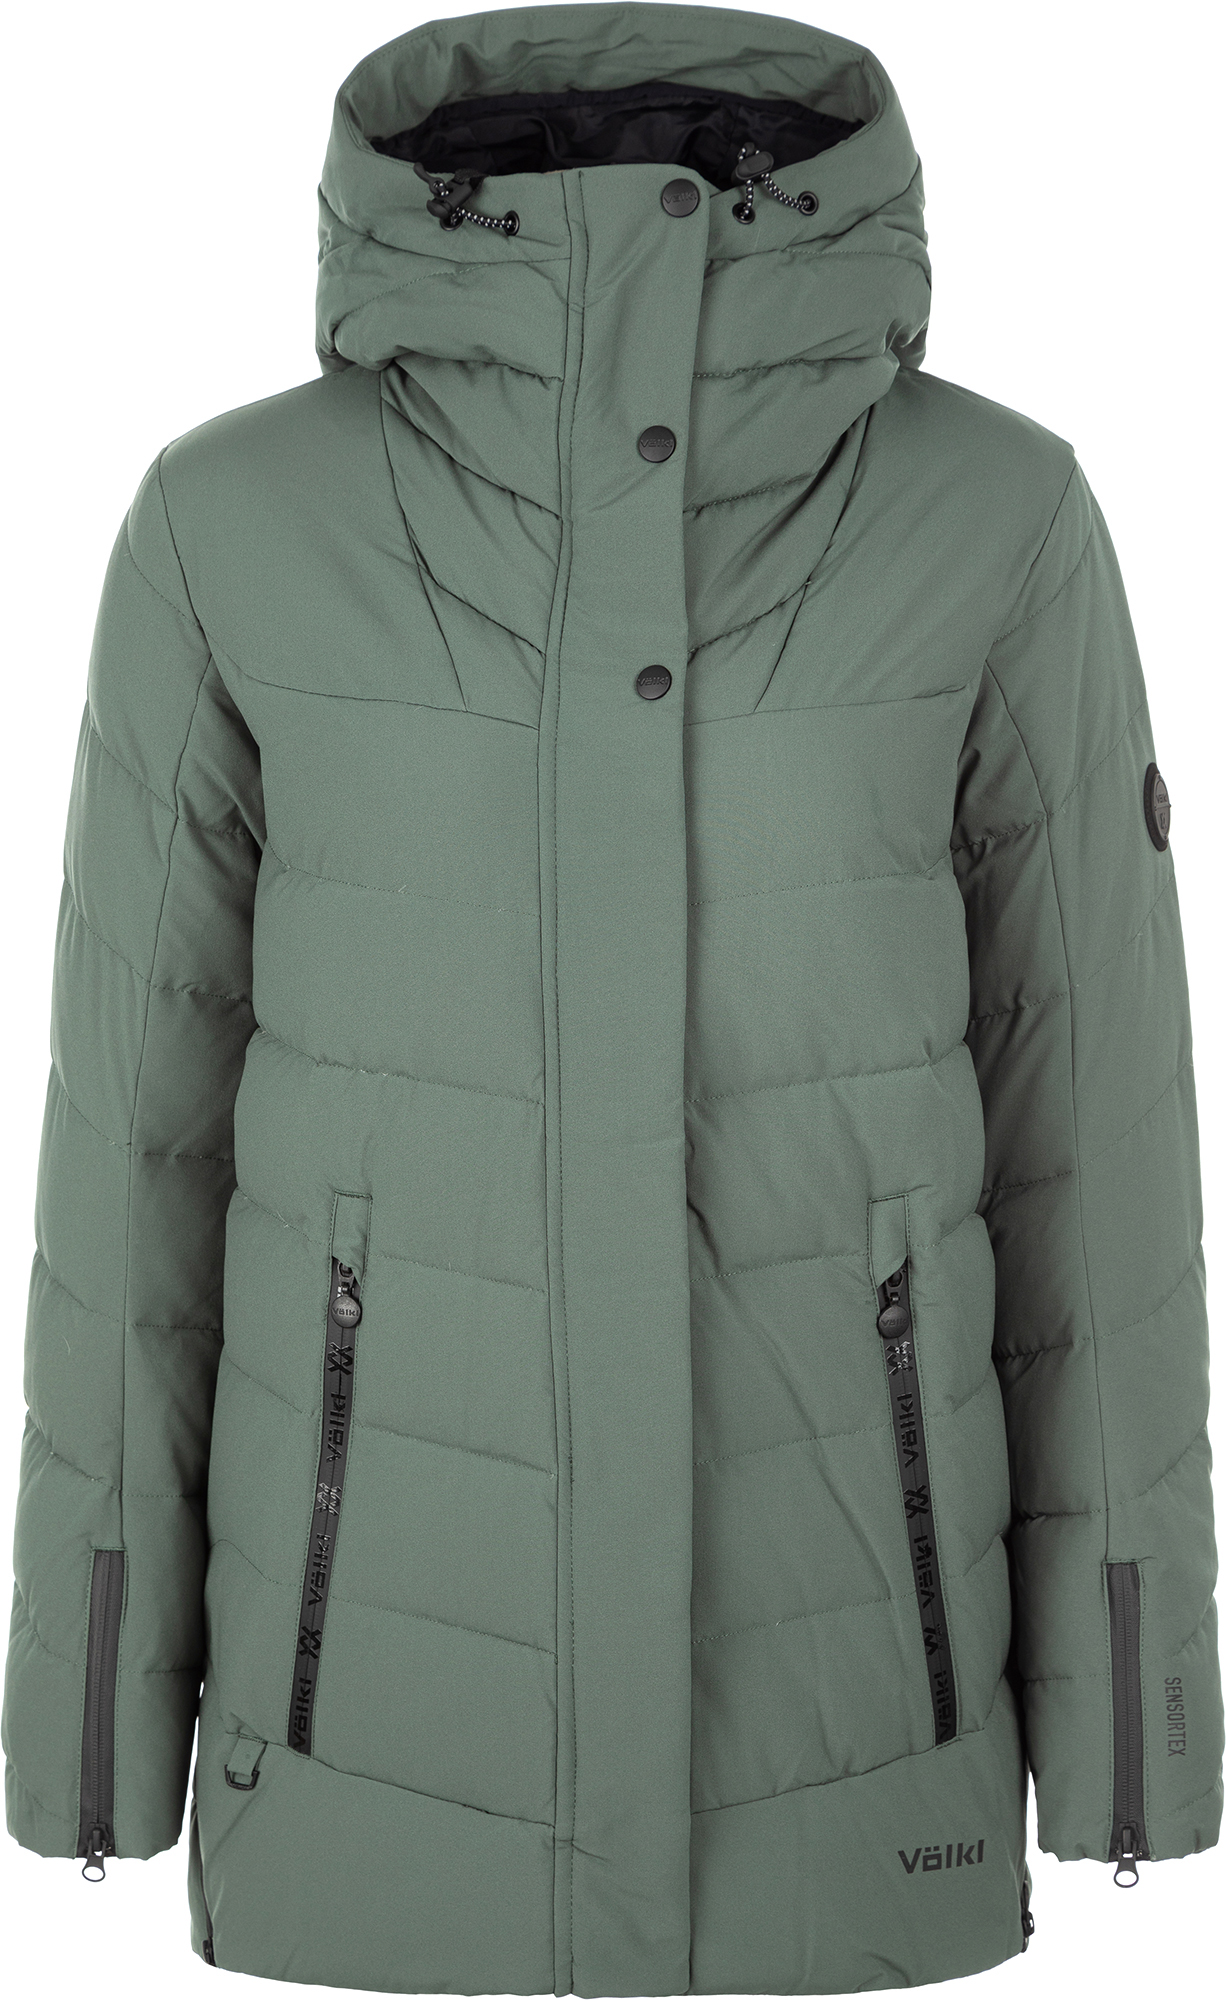 цена Volkl Куртка пуховая женская Volkl, размер 48 онлайн в 2017 году